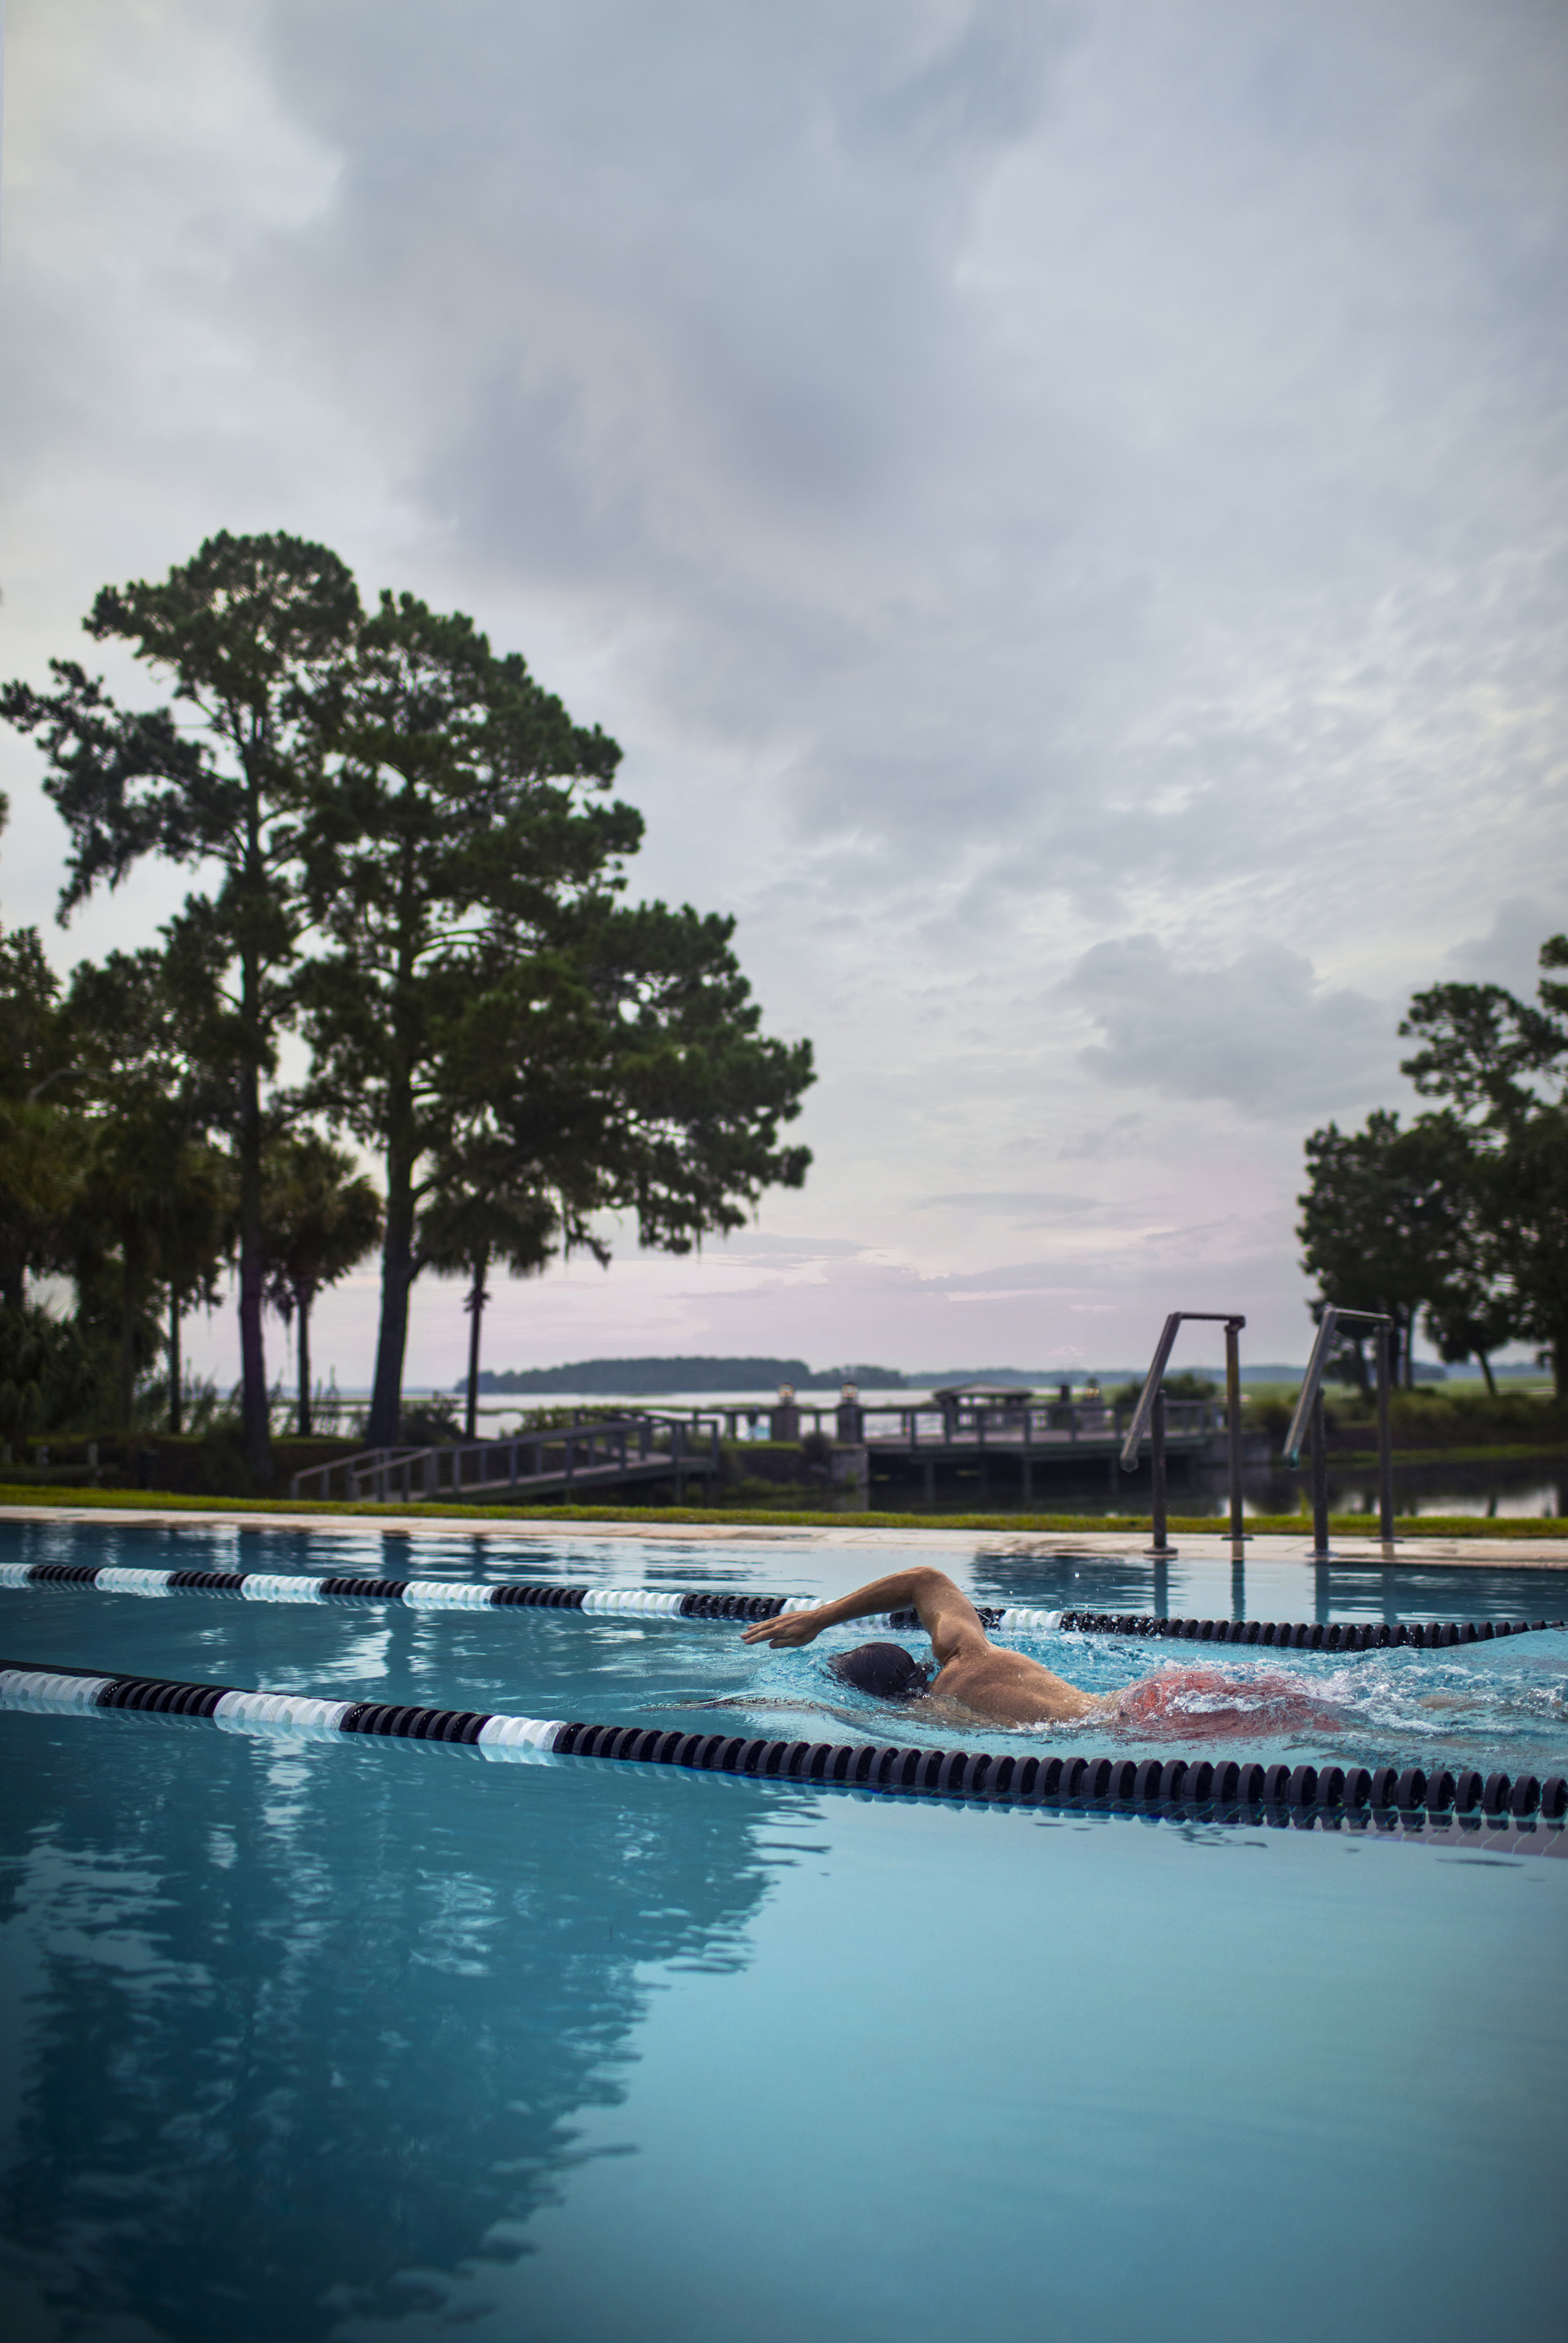 palmettobluff_rustywilliams_morningswimmer.jpg